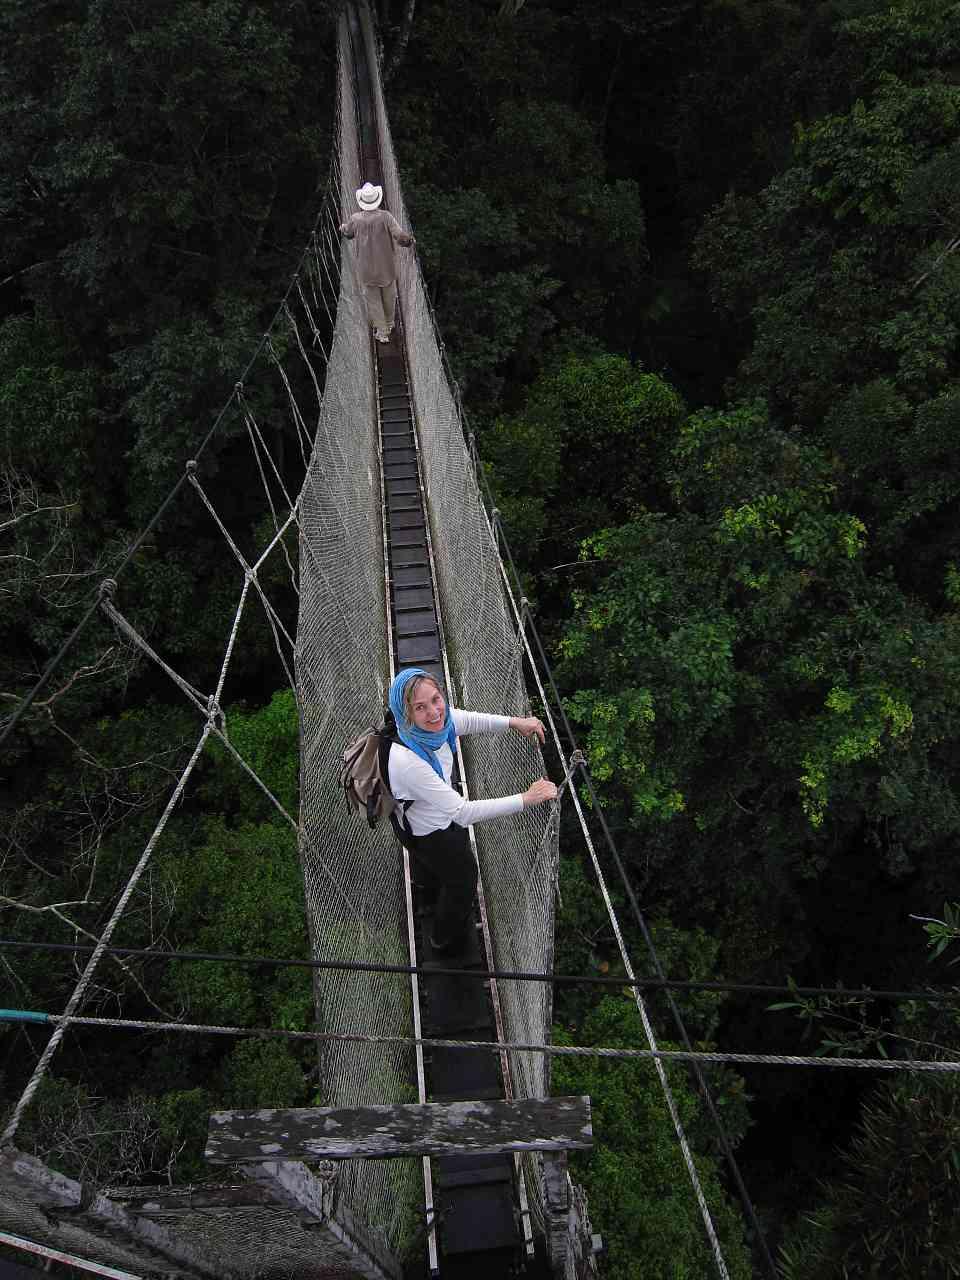 Mary and the Amazon canopy